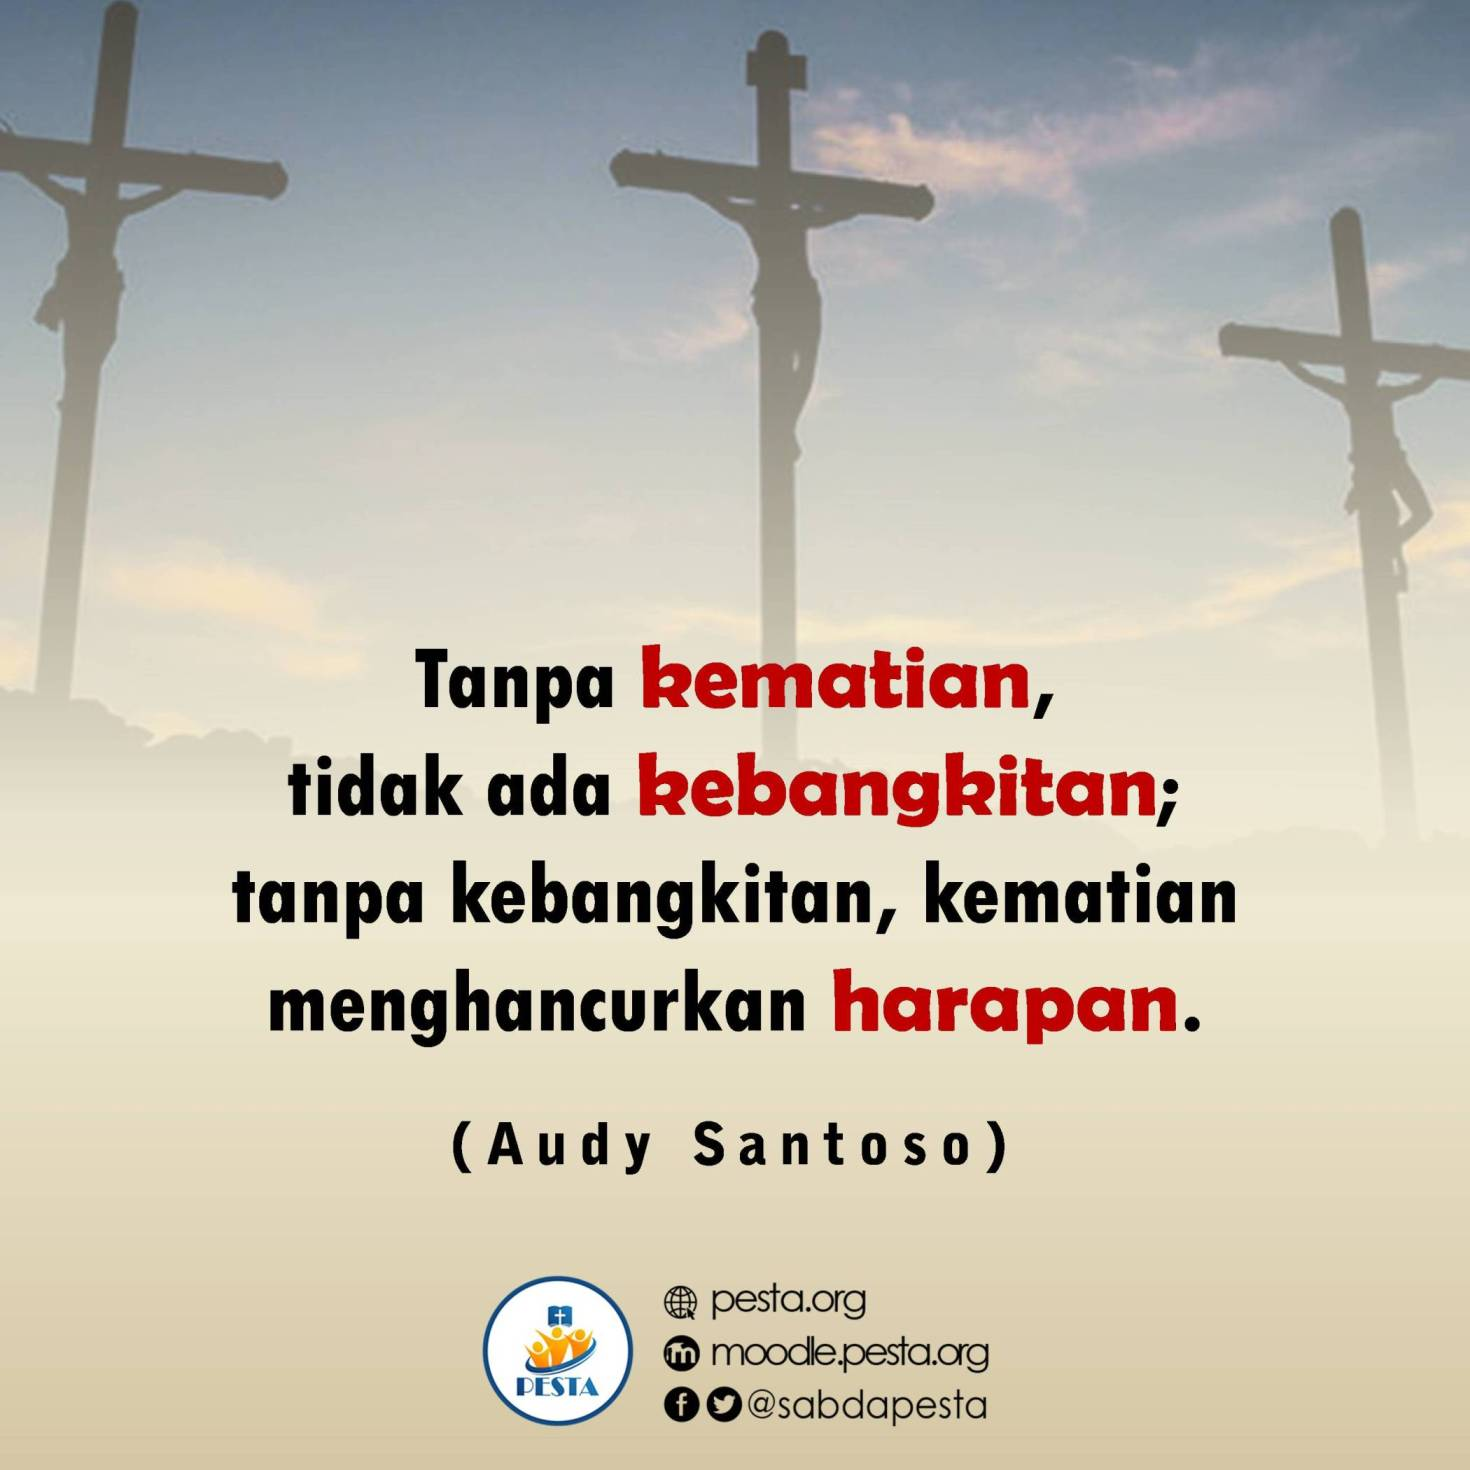 Audy Santoso